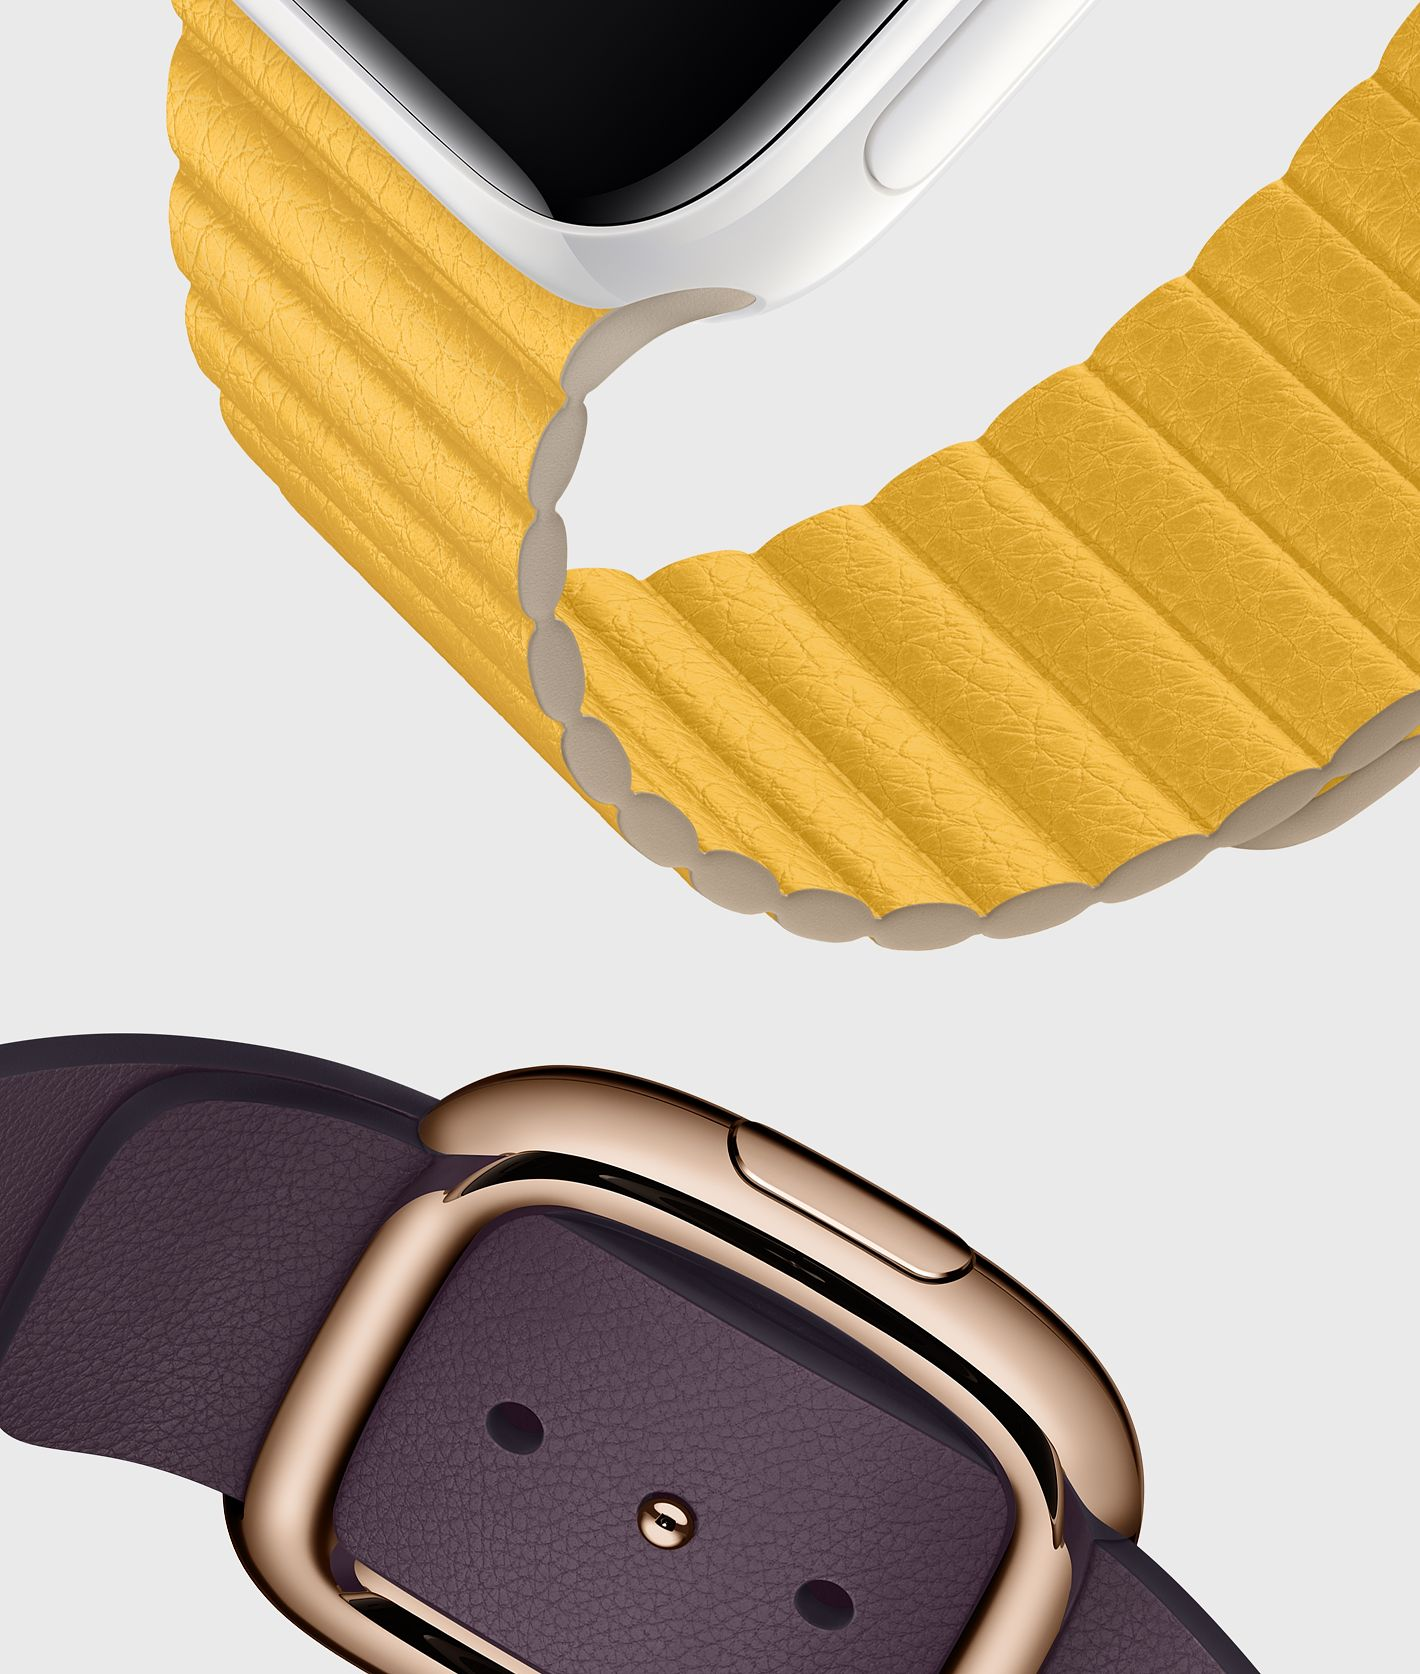 apple watch leren bandjes eind 2019